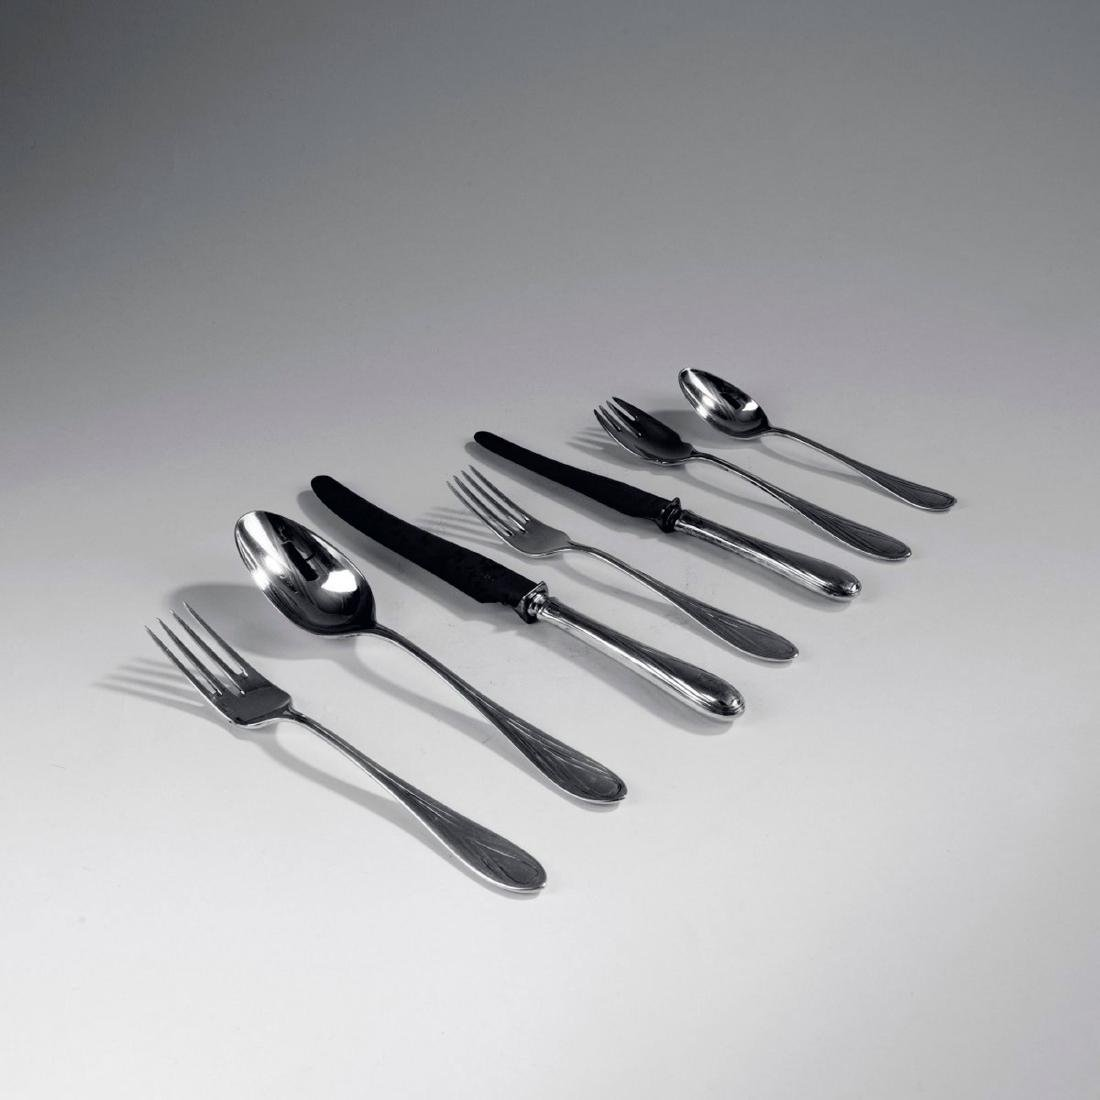 '3001' cutlery in original wooden box, 1901/02 - 2